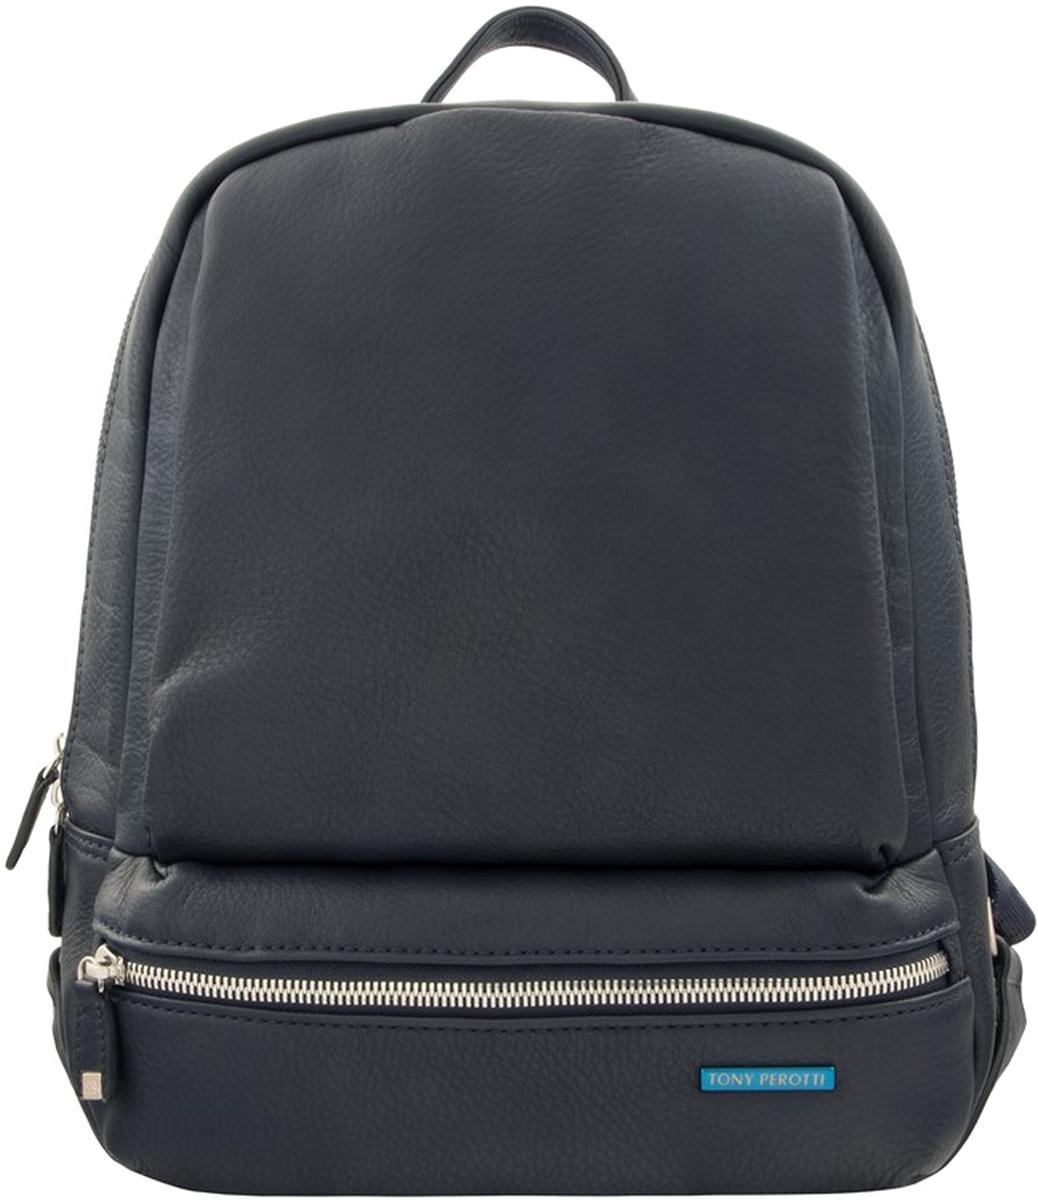 Рюкзак женский Tony Perotti, цвет: темно-синий. 560122/23